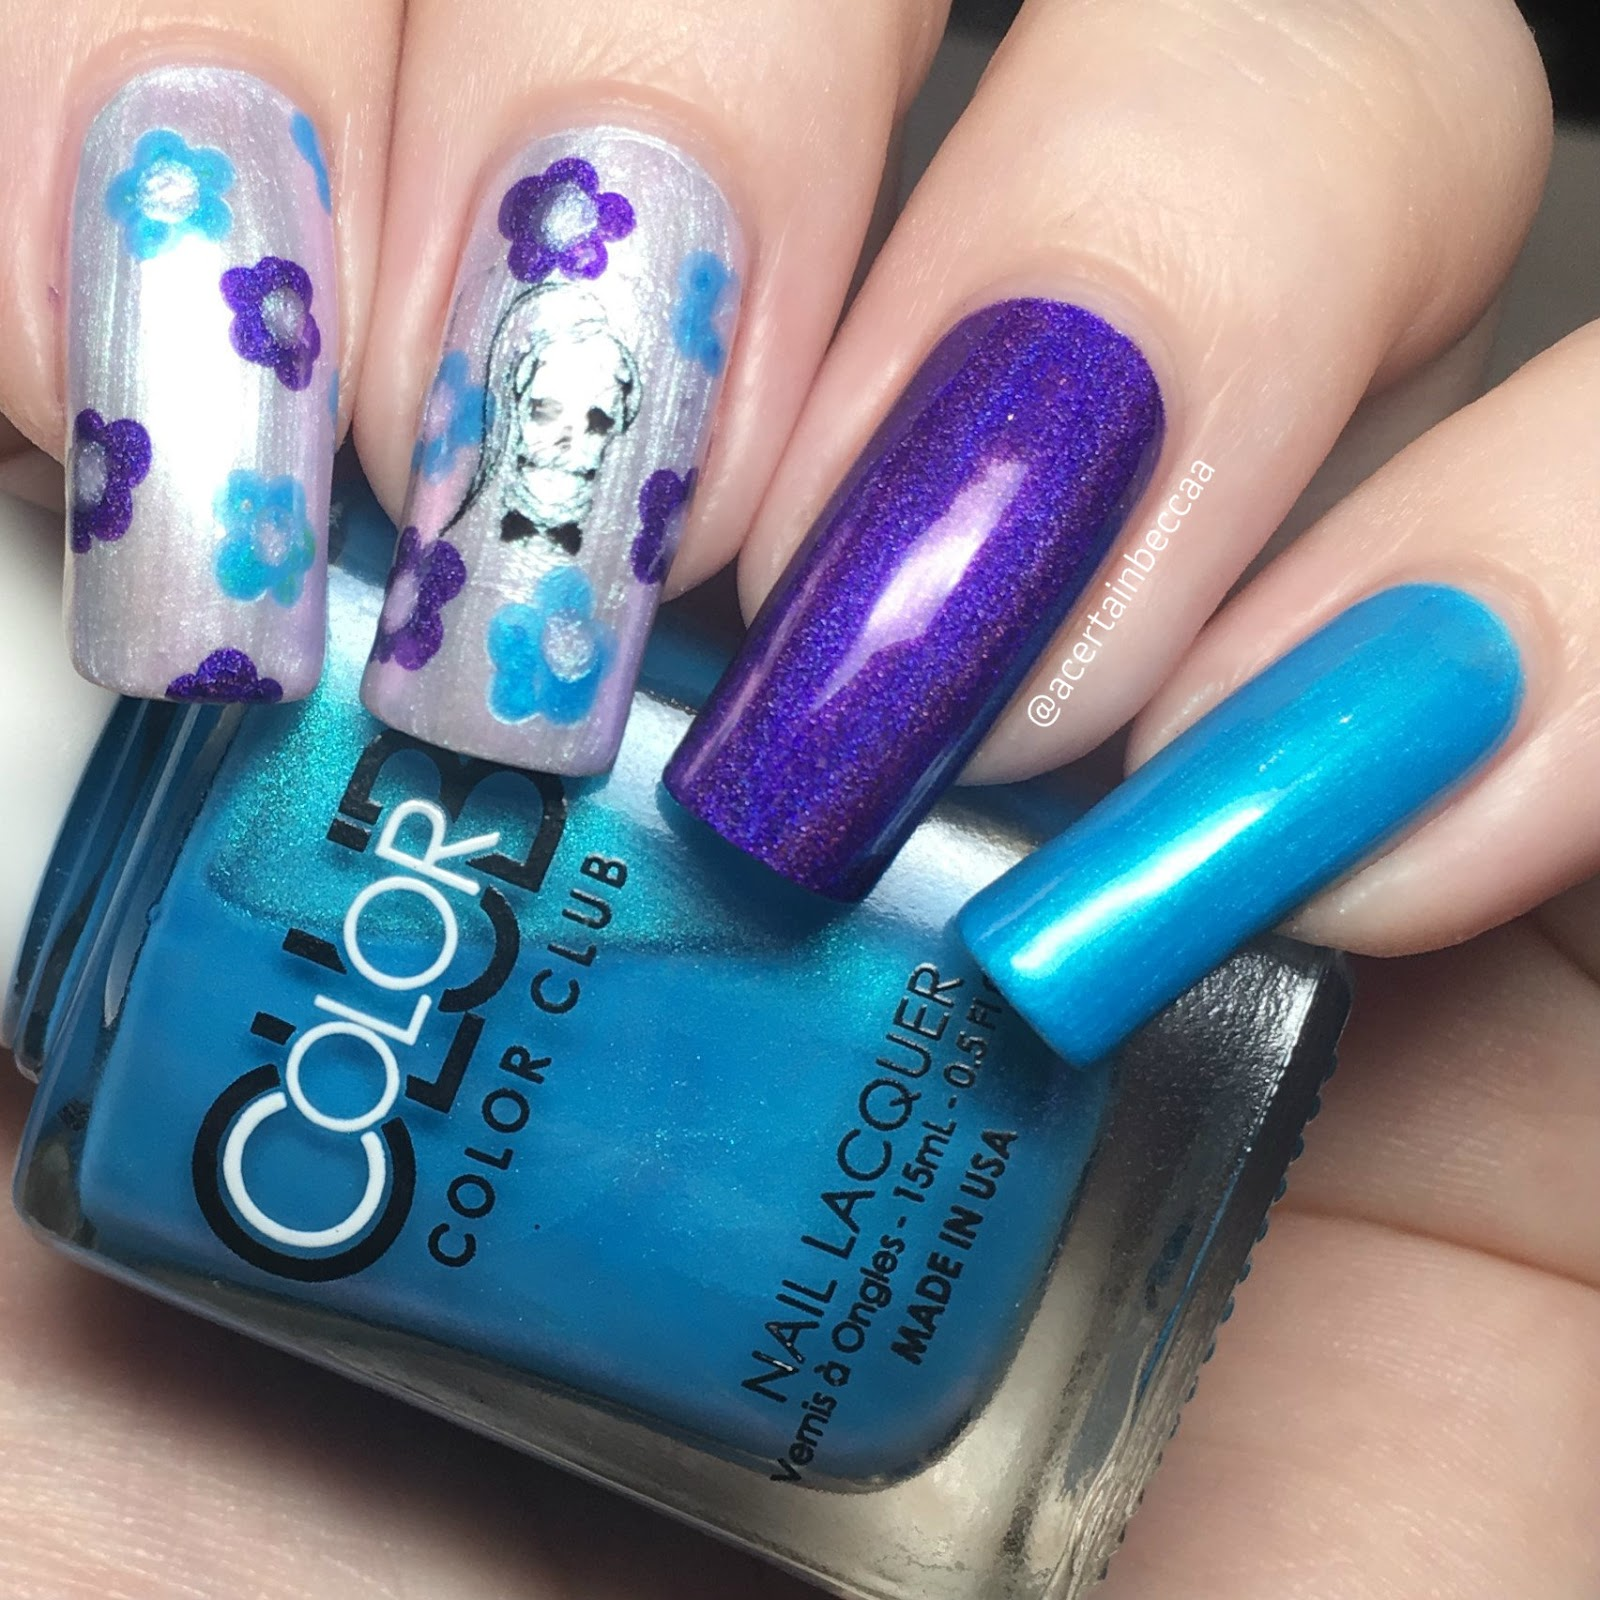 A Certain Becca Nails: 26 Great Nail Art Ideas \'Dotting Tools, But ...